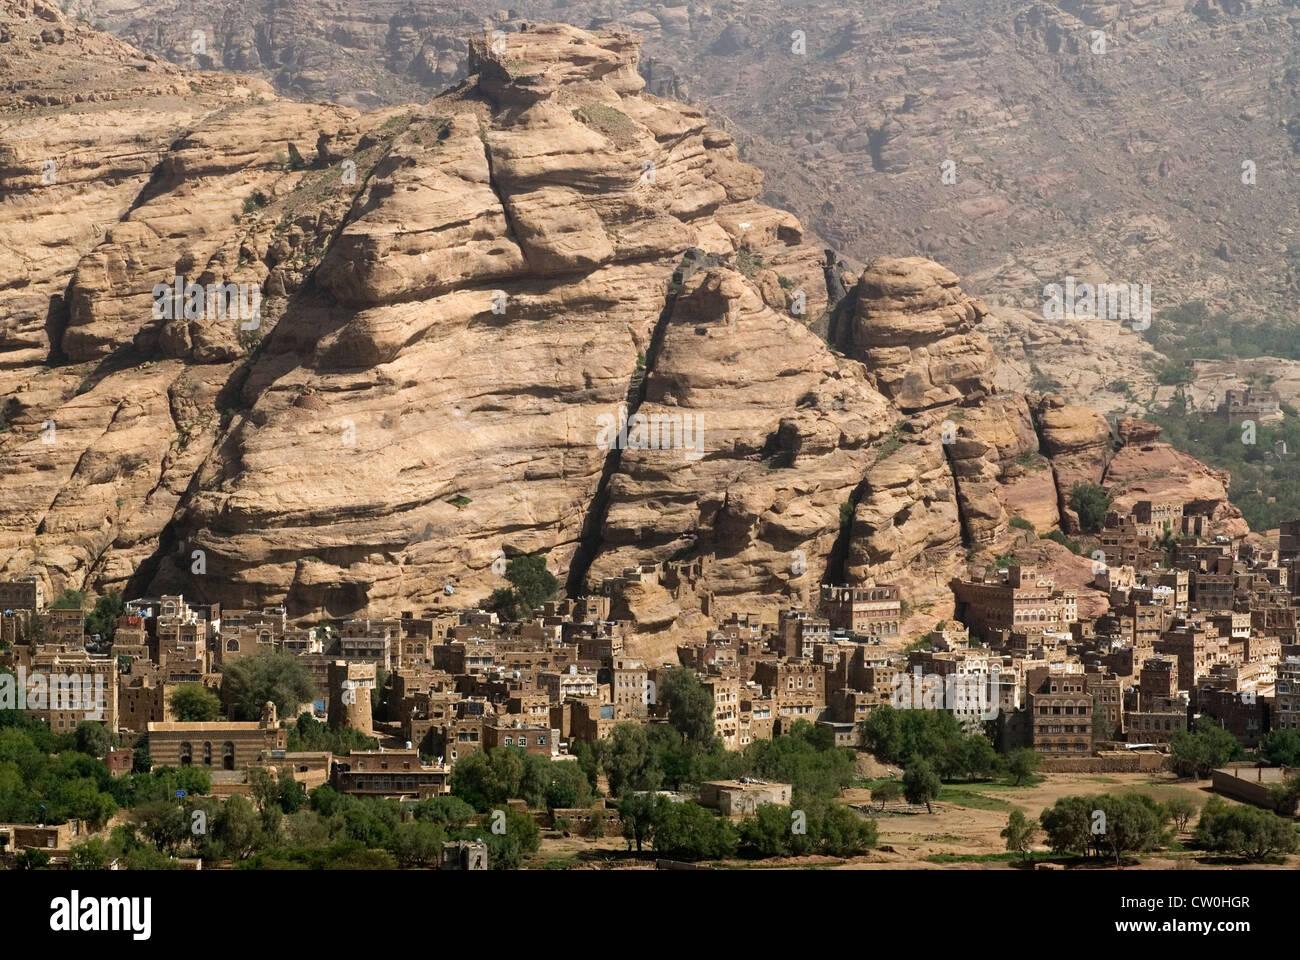 Landscape of Wadi Dhahr, Yemen, Western Asia, Arabian Peninsula. - Stock Image